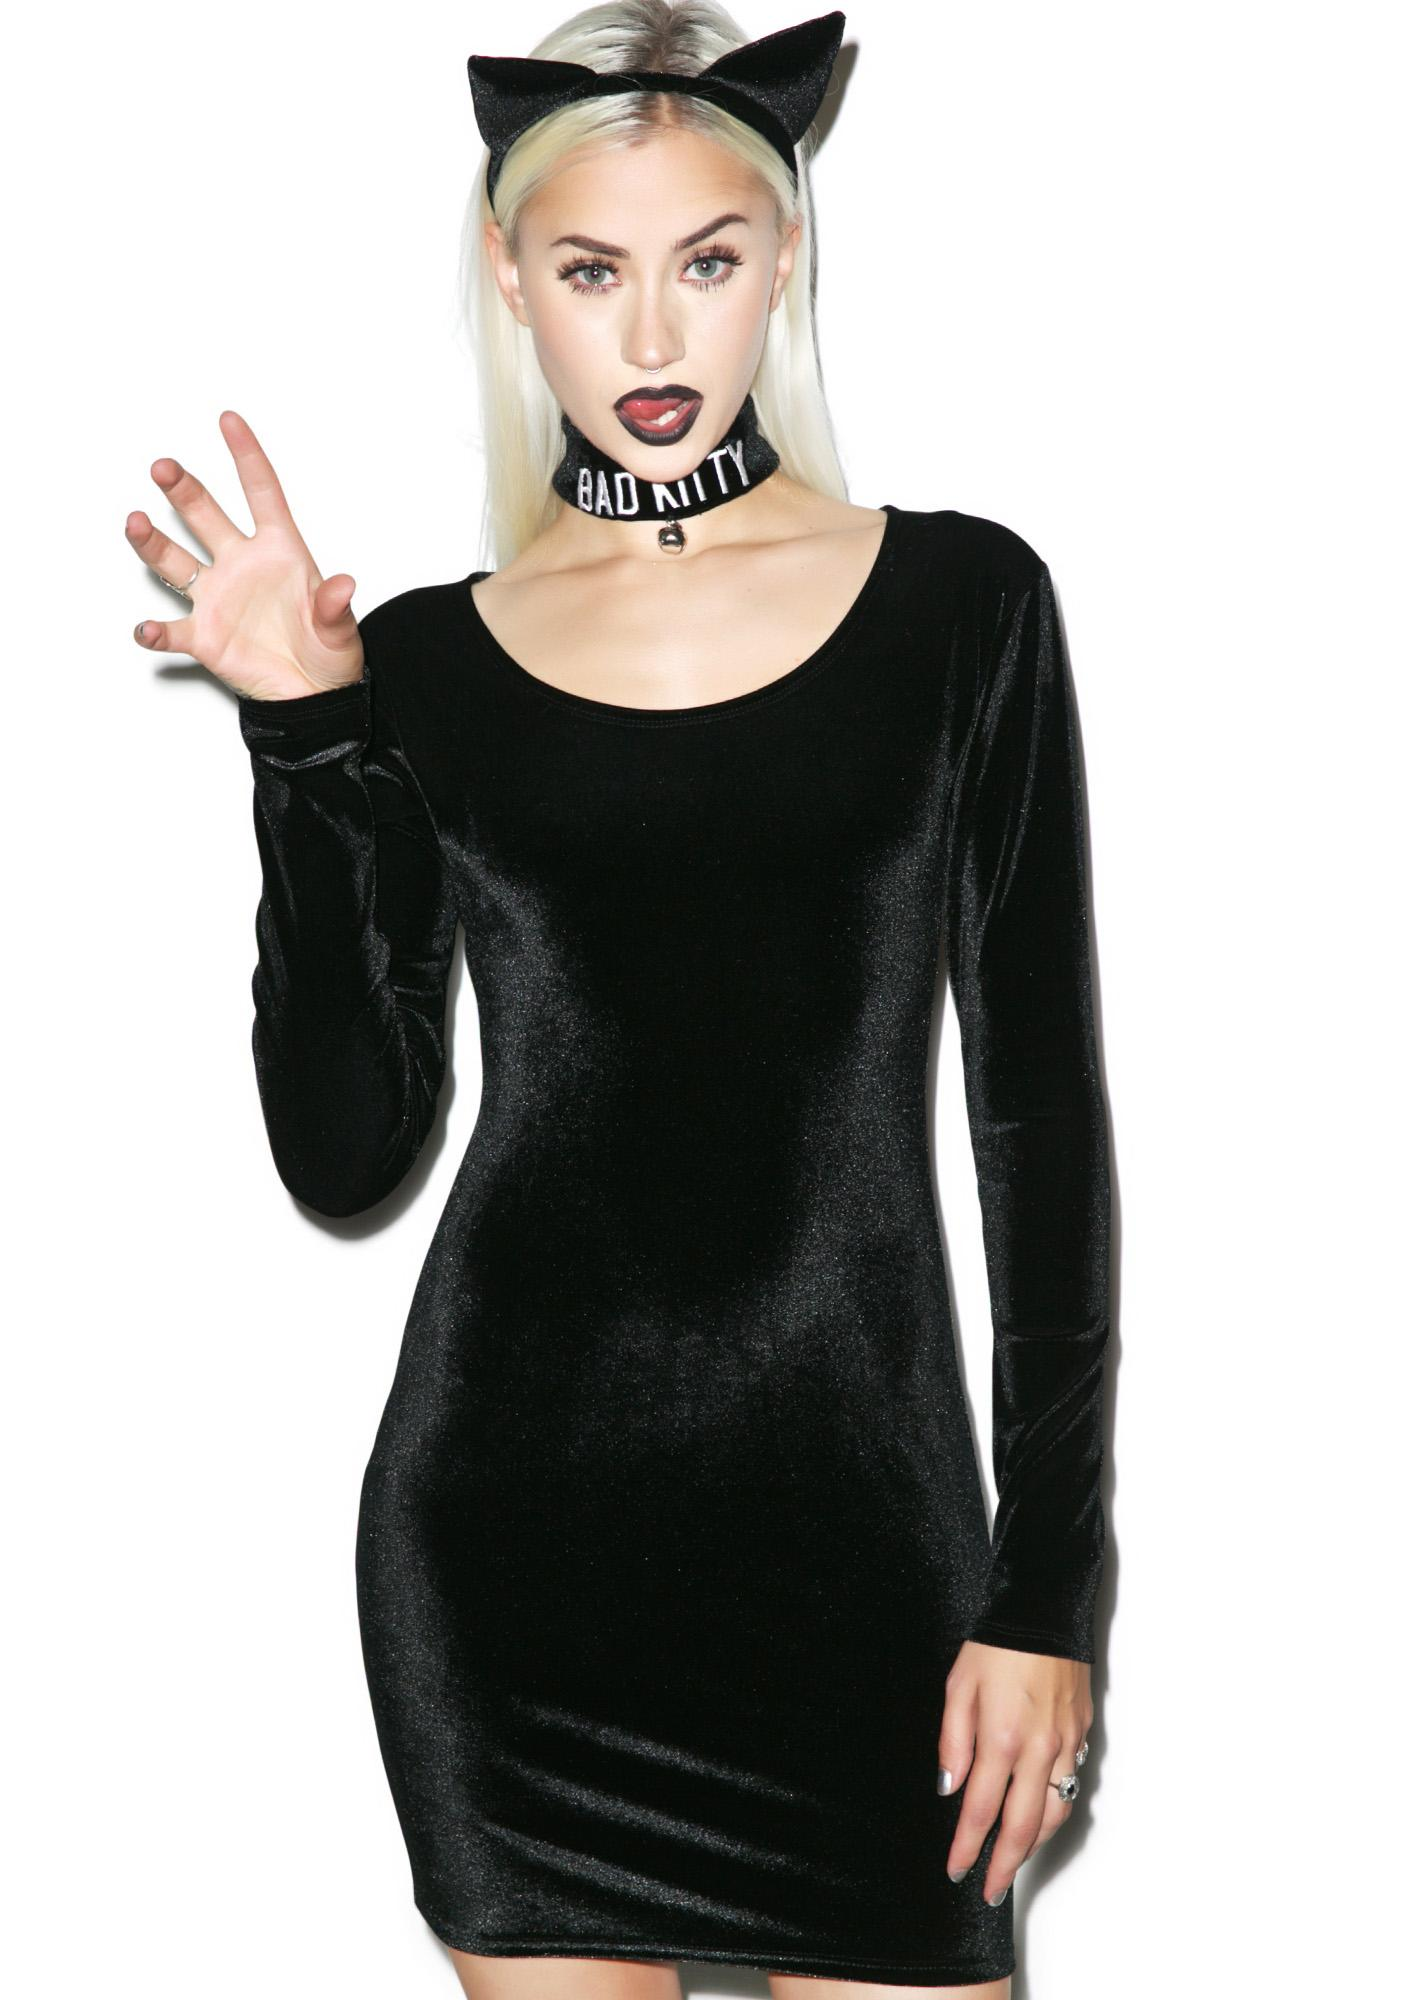 The Good Kitty, Bad Kitty Dress